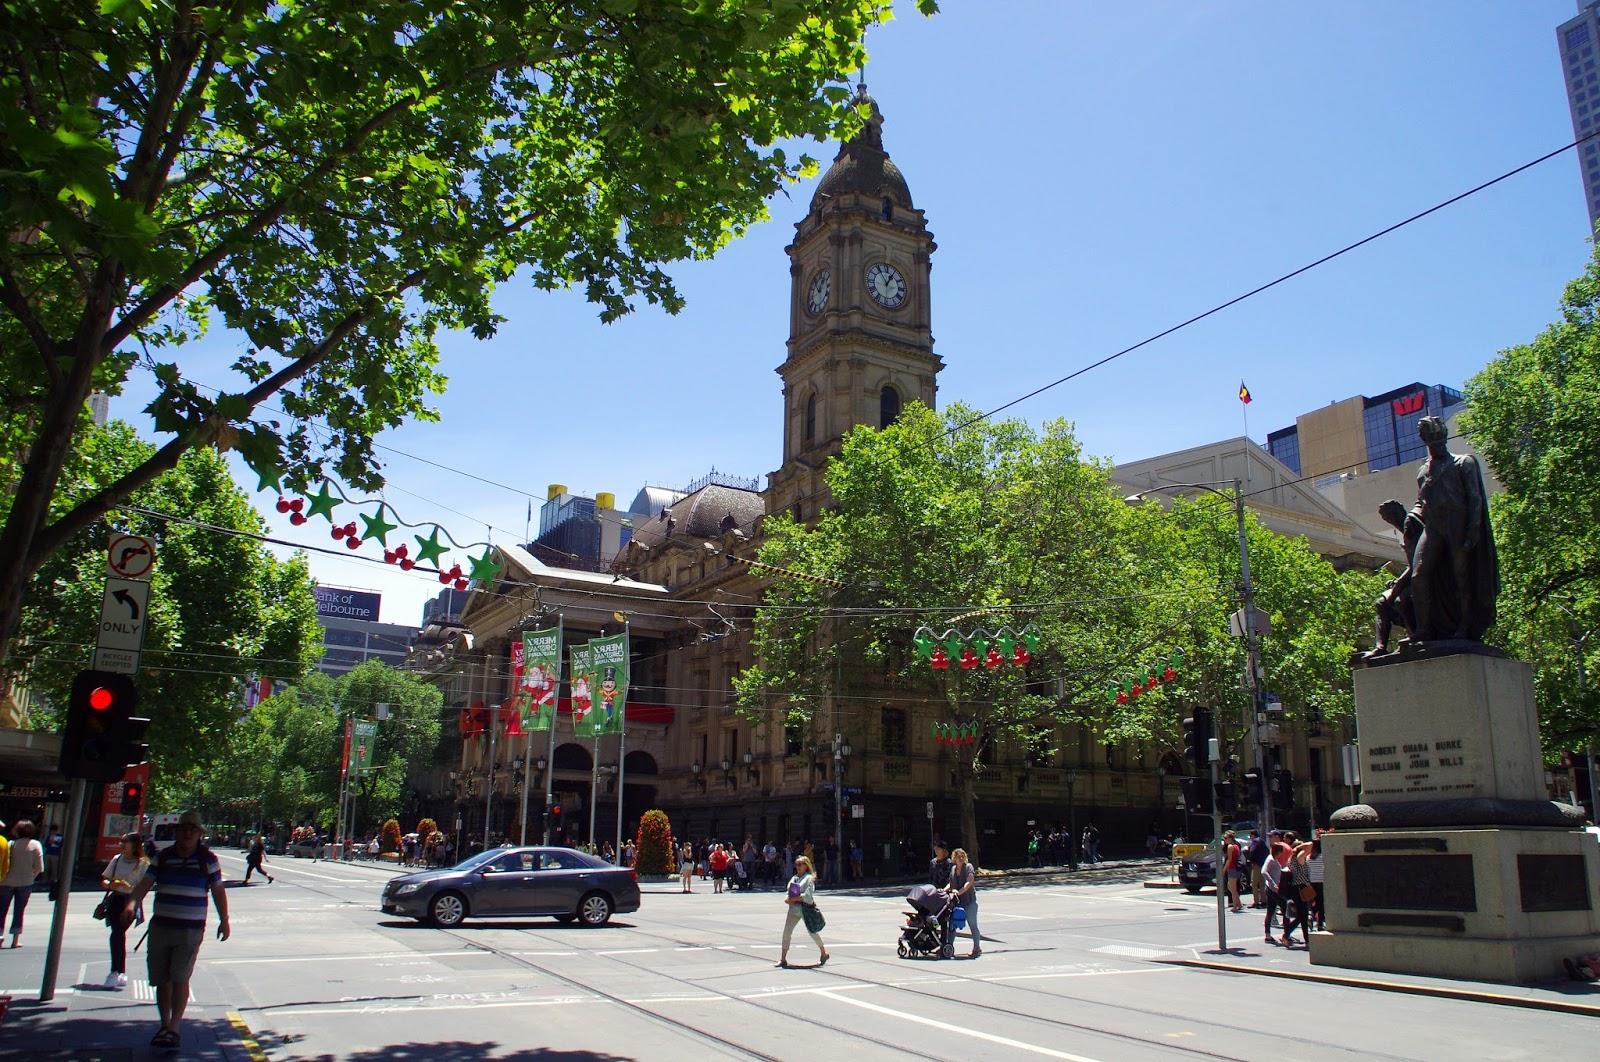 Bourke Street Mall Melbourne CBD